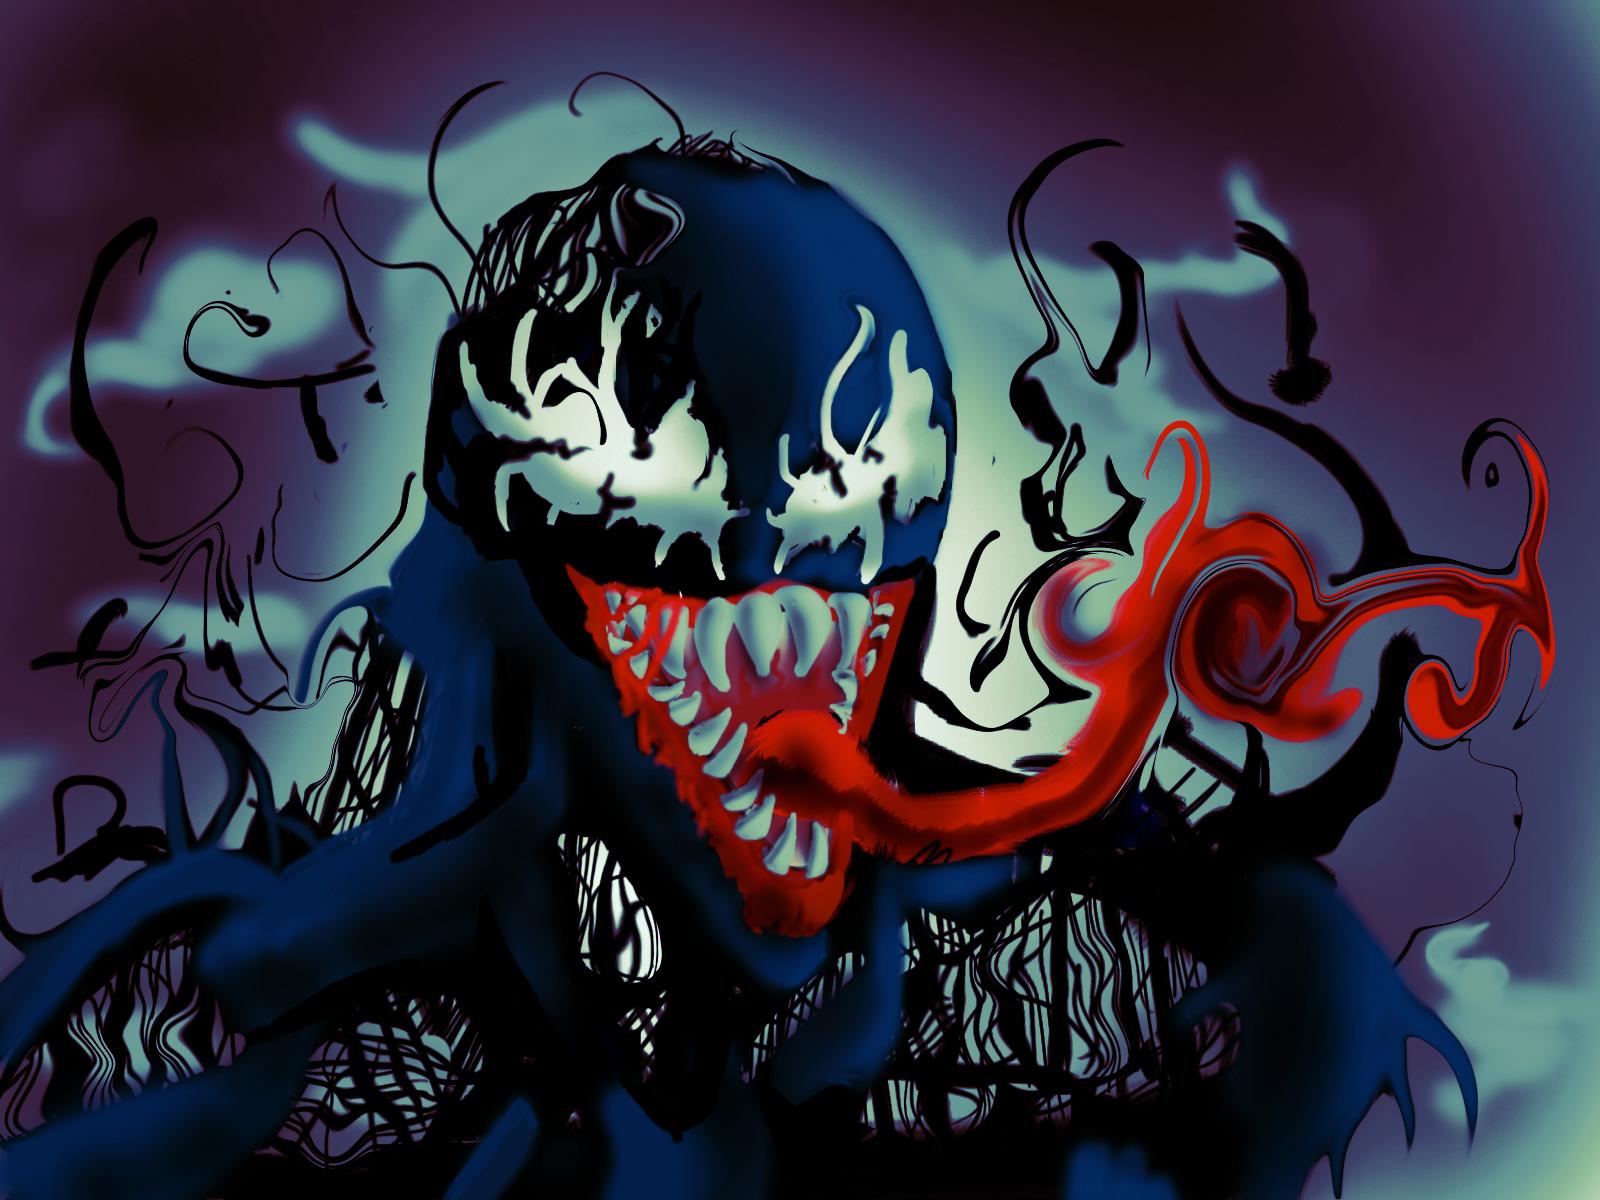 Regenerating venom?